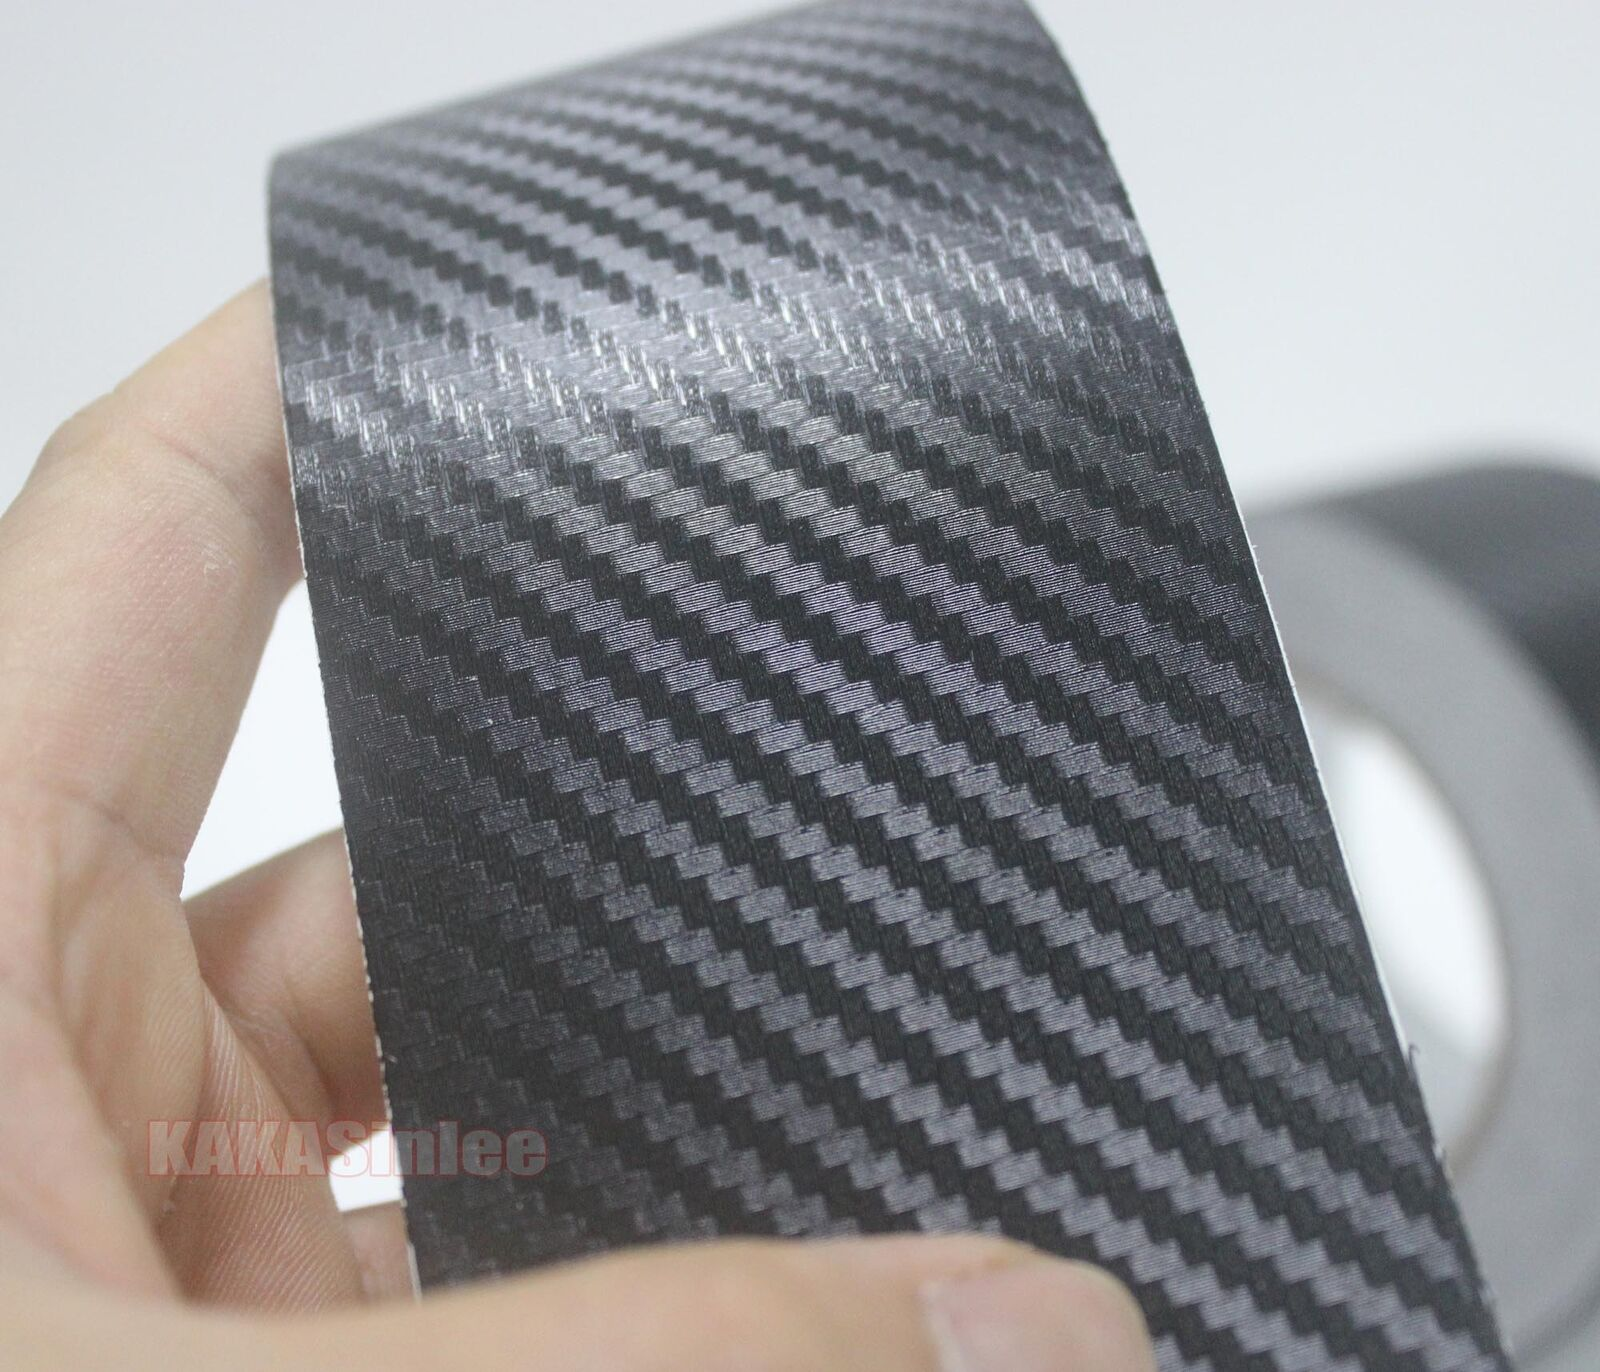 Diy Adhesive Vehicle Black 3d Texture Carbon Fiber Vinyl